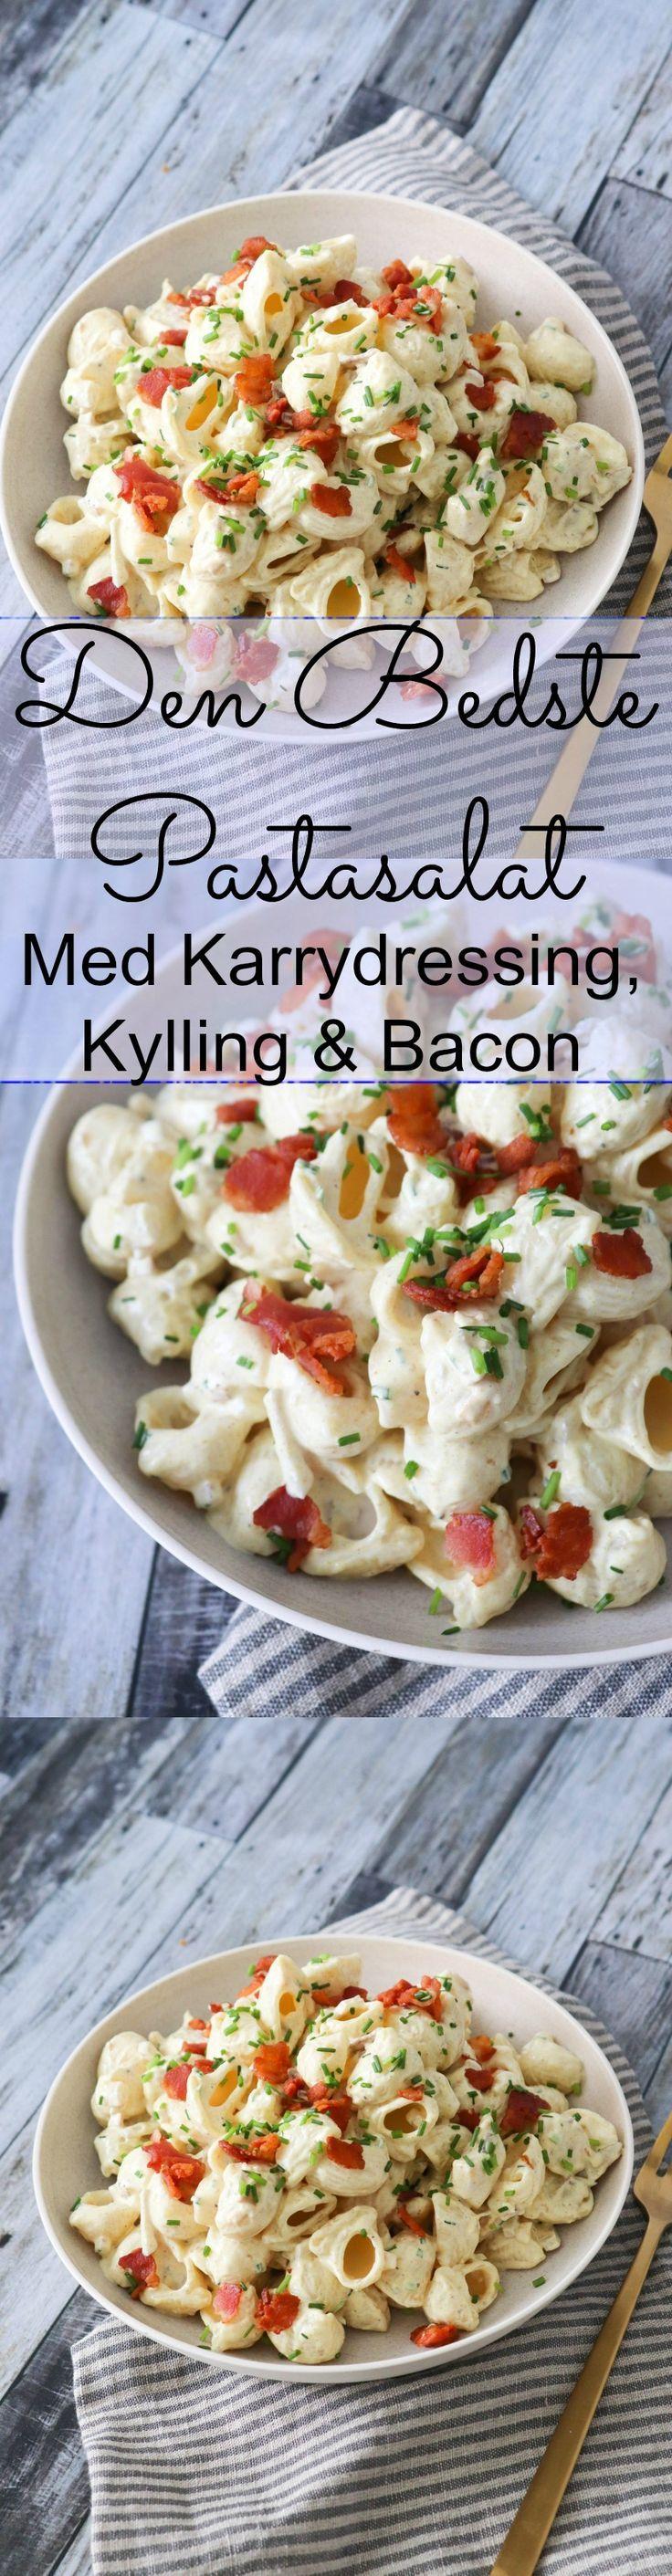 Pastasalat Med Kylling, Bacon Og Karrydressing #tapasideer